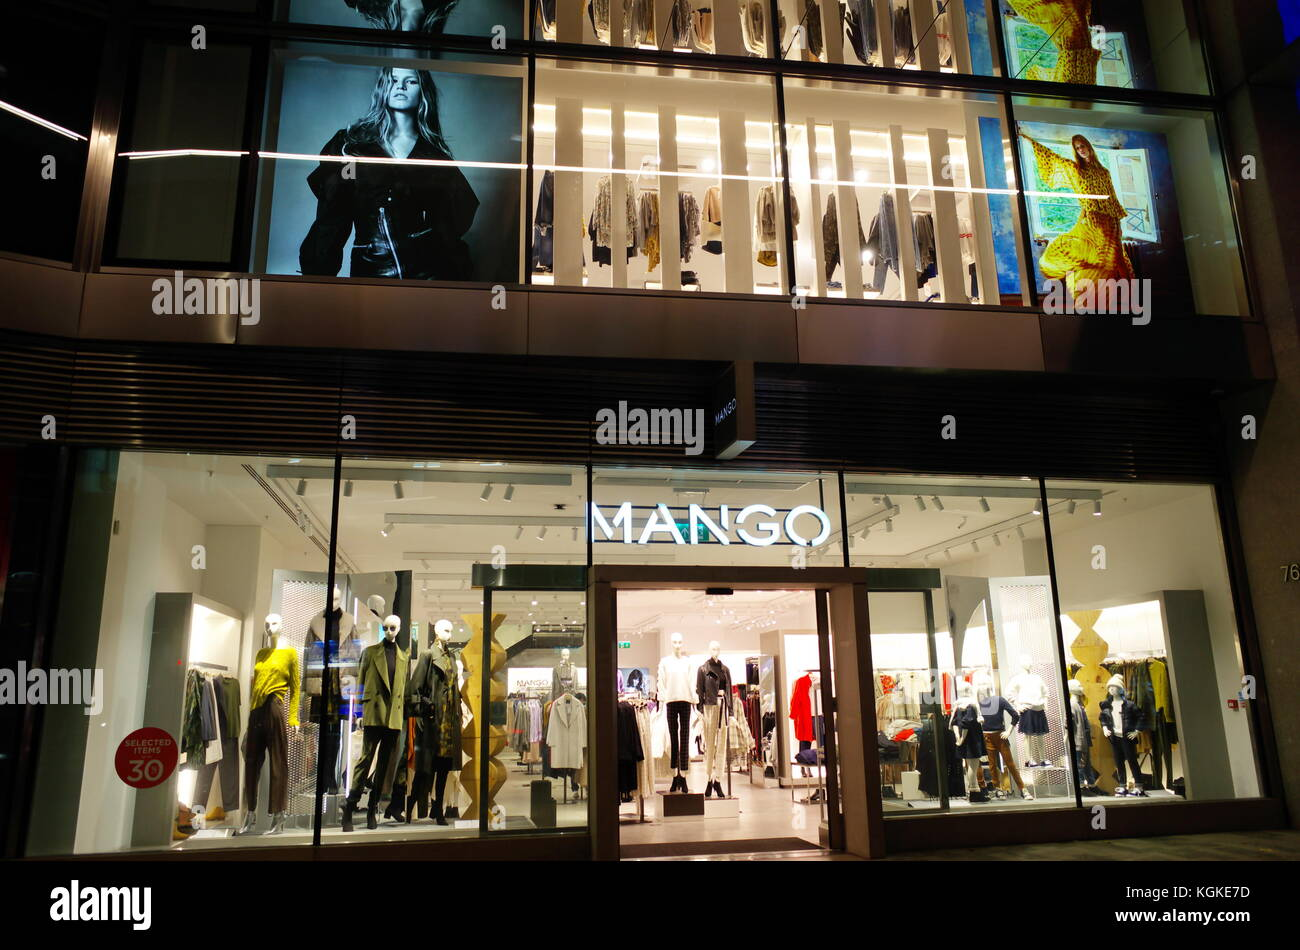 Mango clothes store